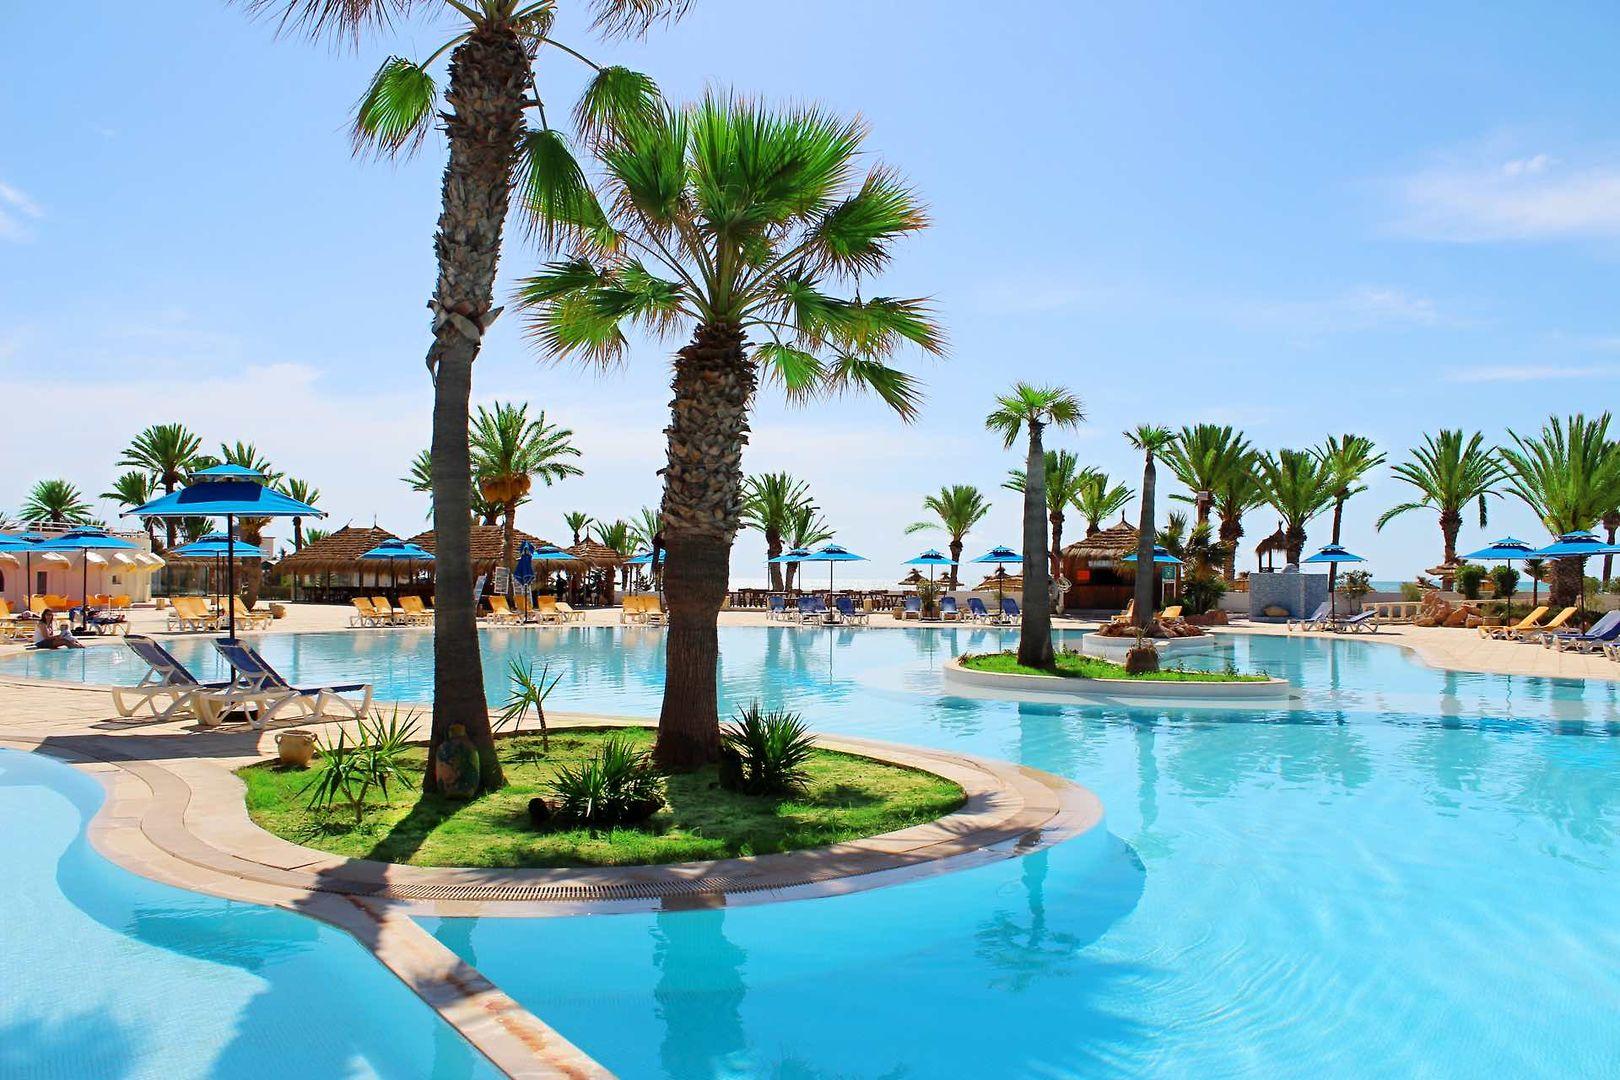 Hotel Royal Karthago